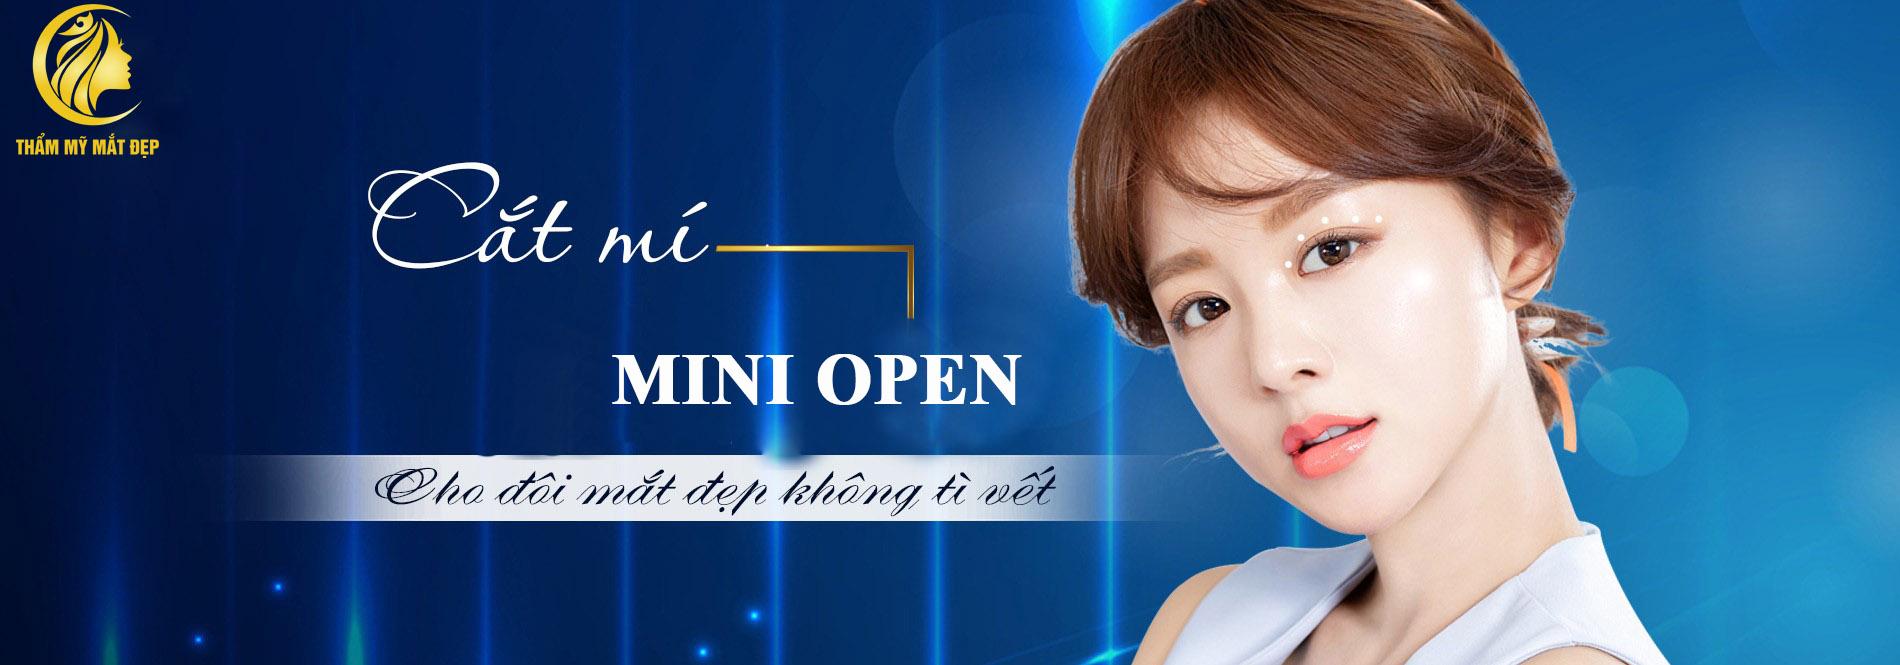 cat-mi-mini-open